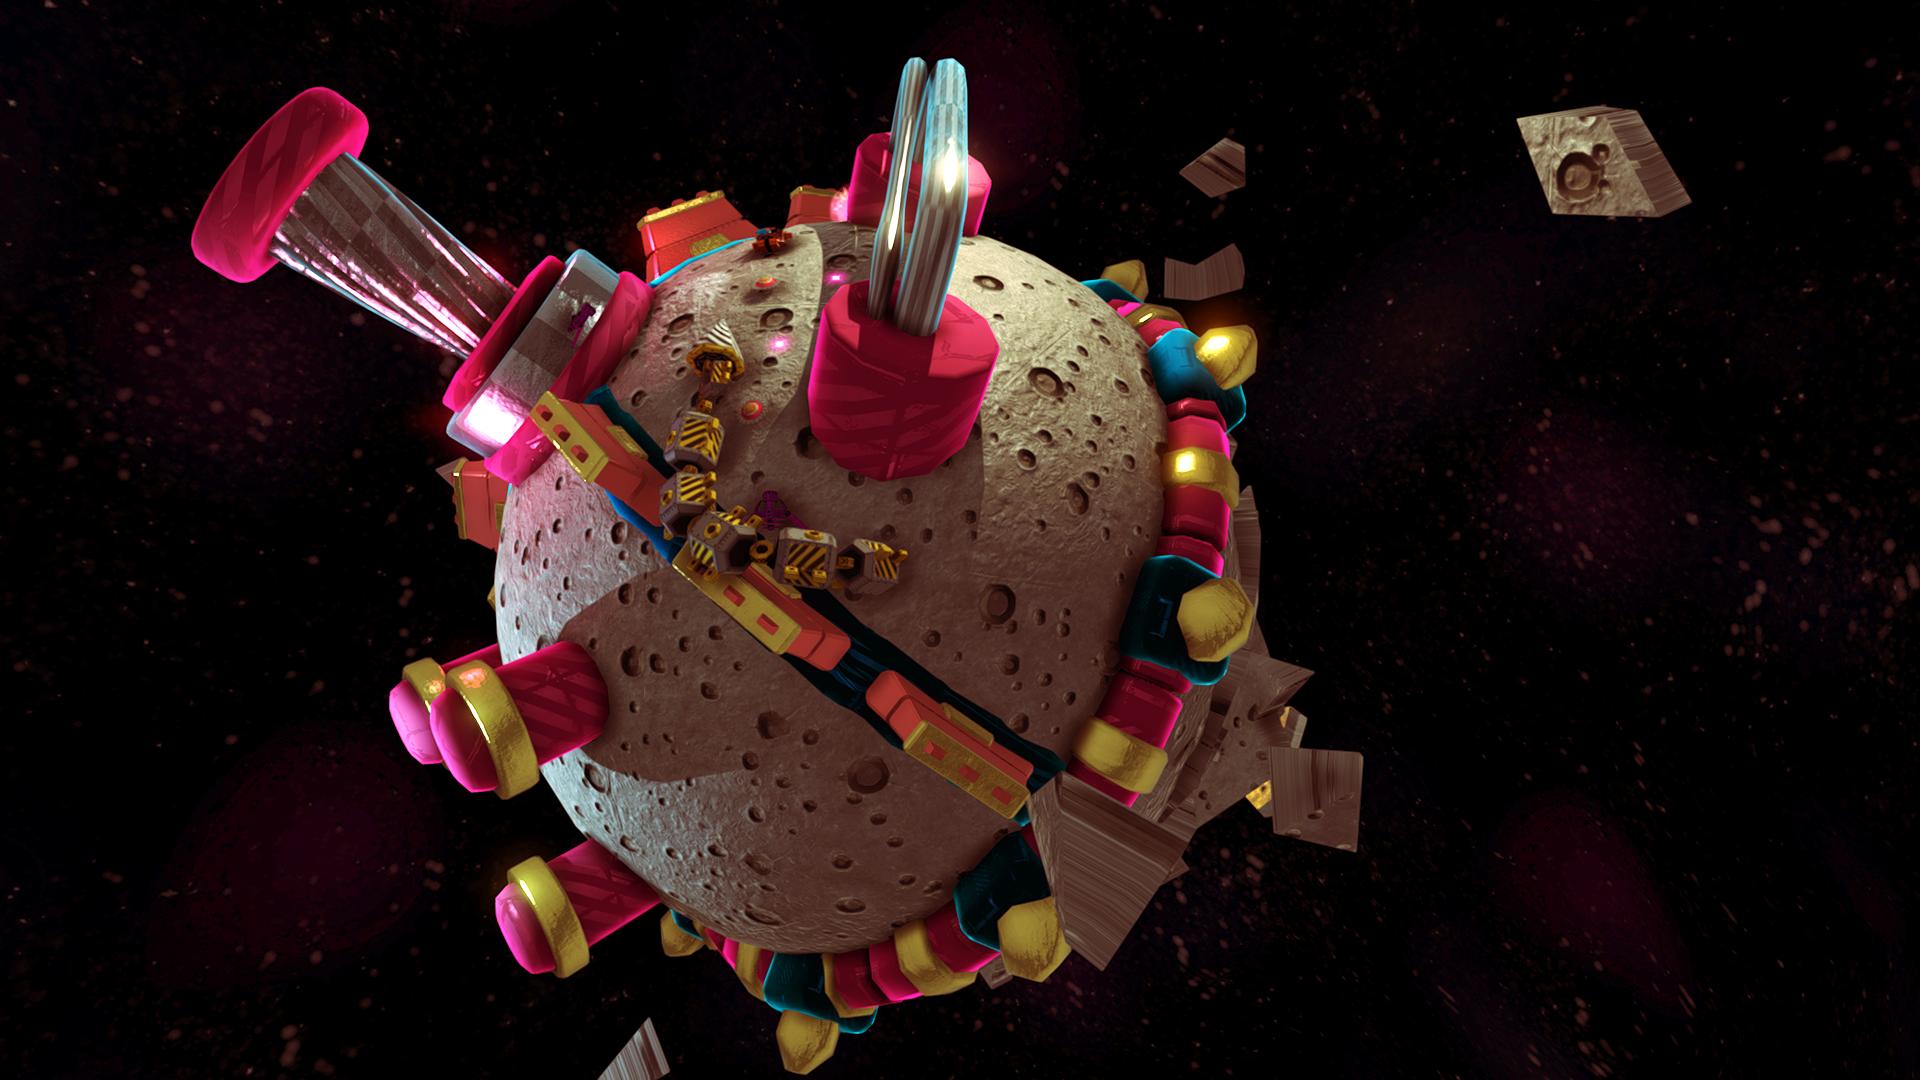 Robo_Mining_planet